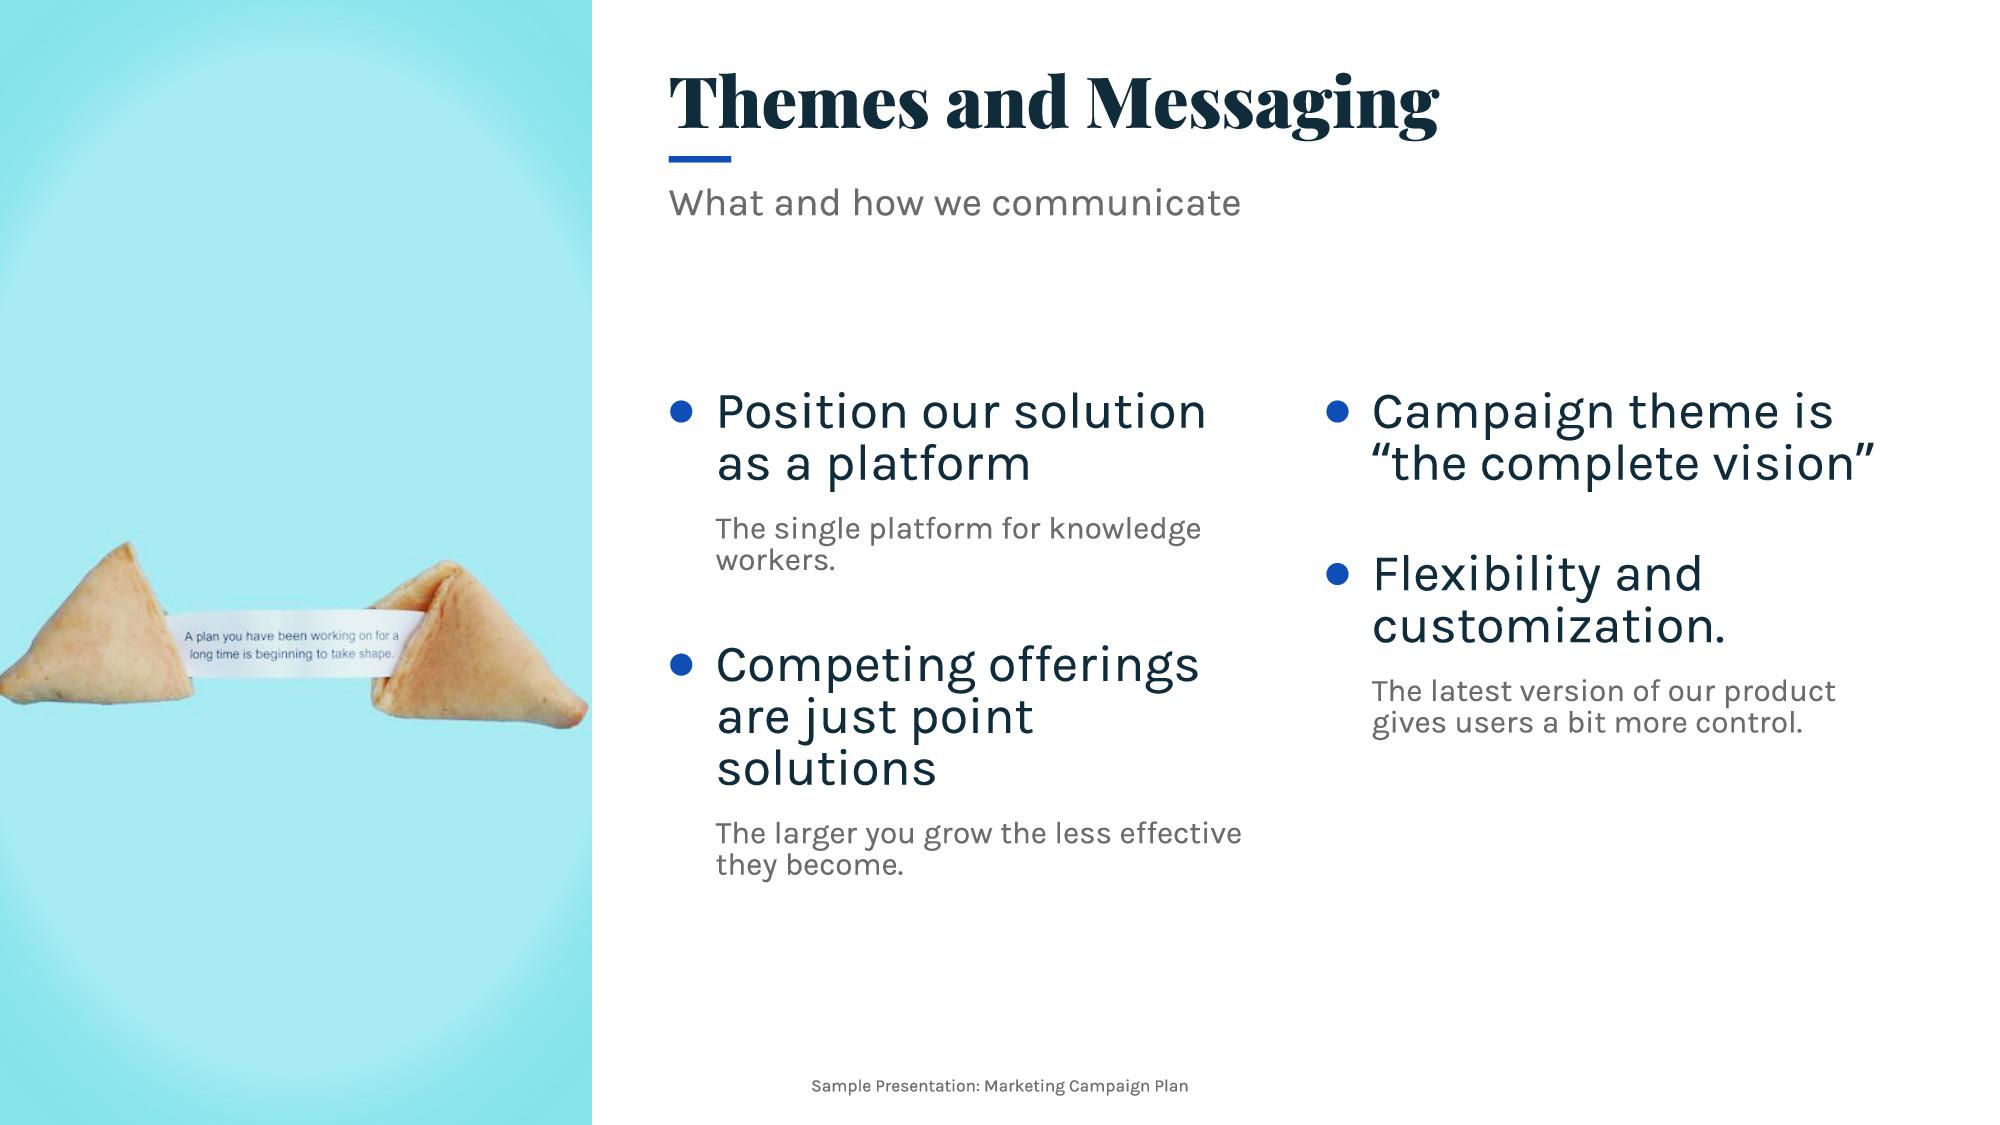 MESSAGING